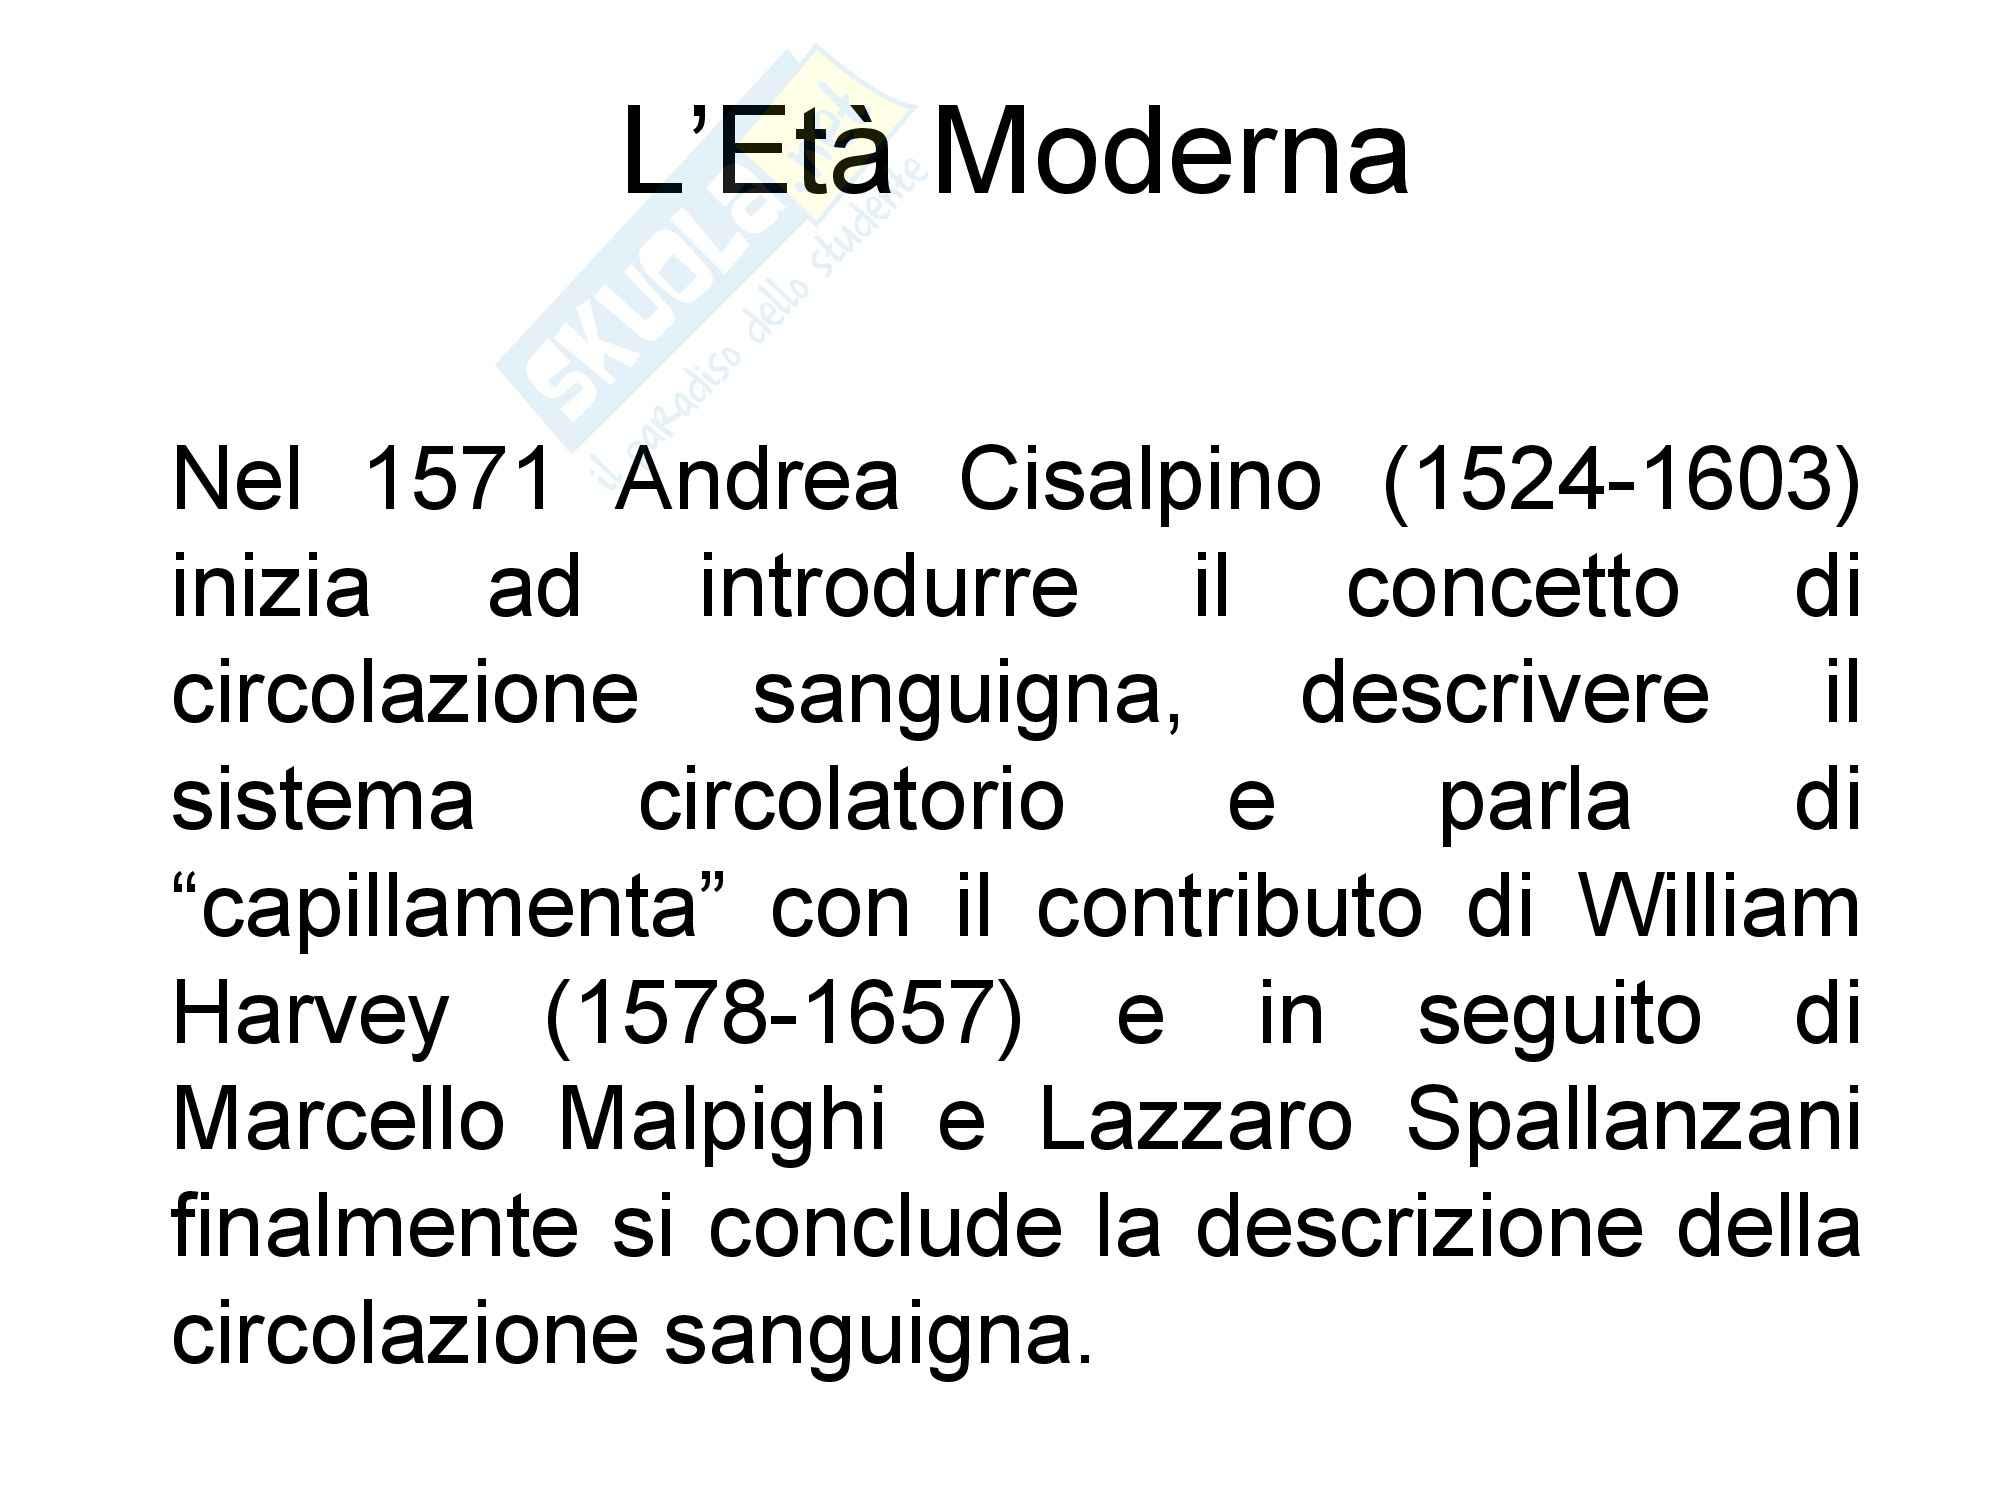 Storia della medicina - Da età classica a moderna Pag. 41